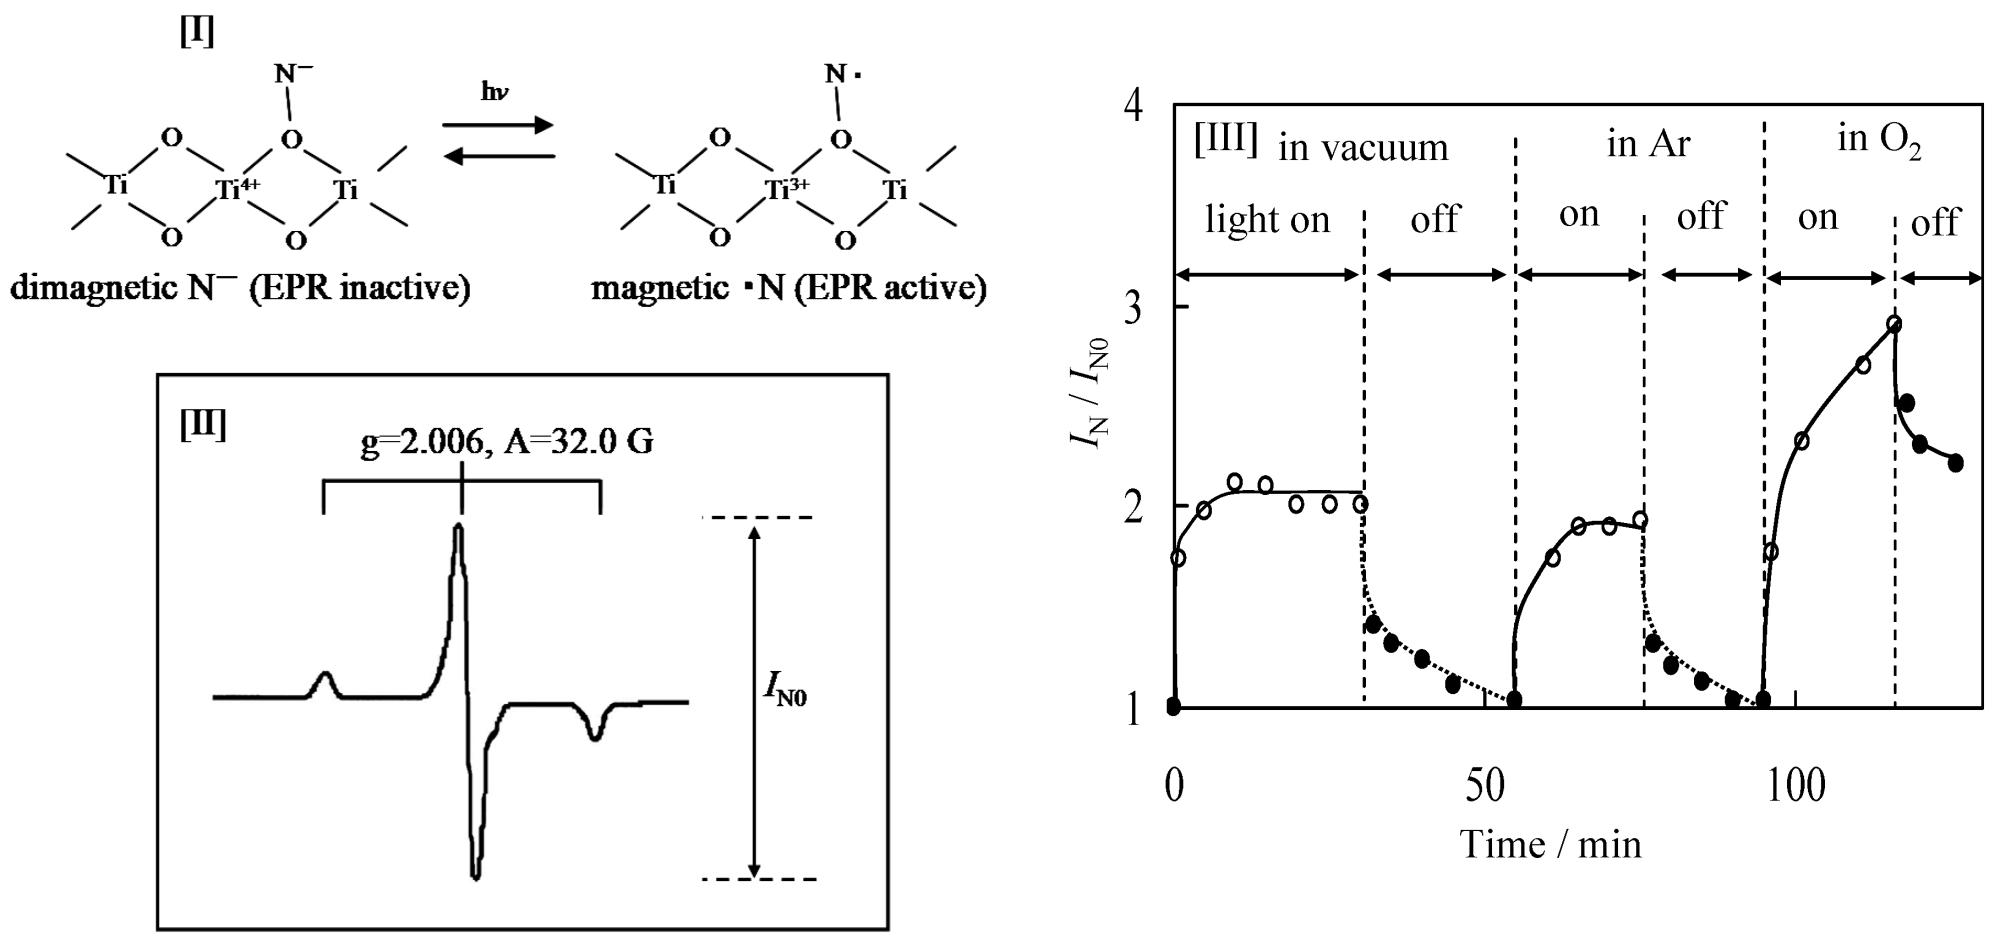 hight resolution of catalysts 09 00201 g005 figure 5 schematic illustration